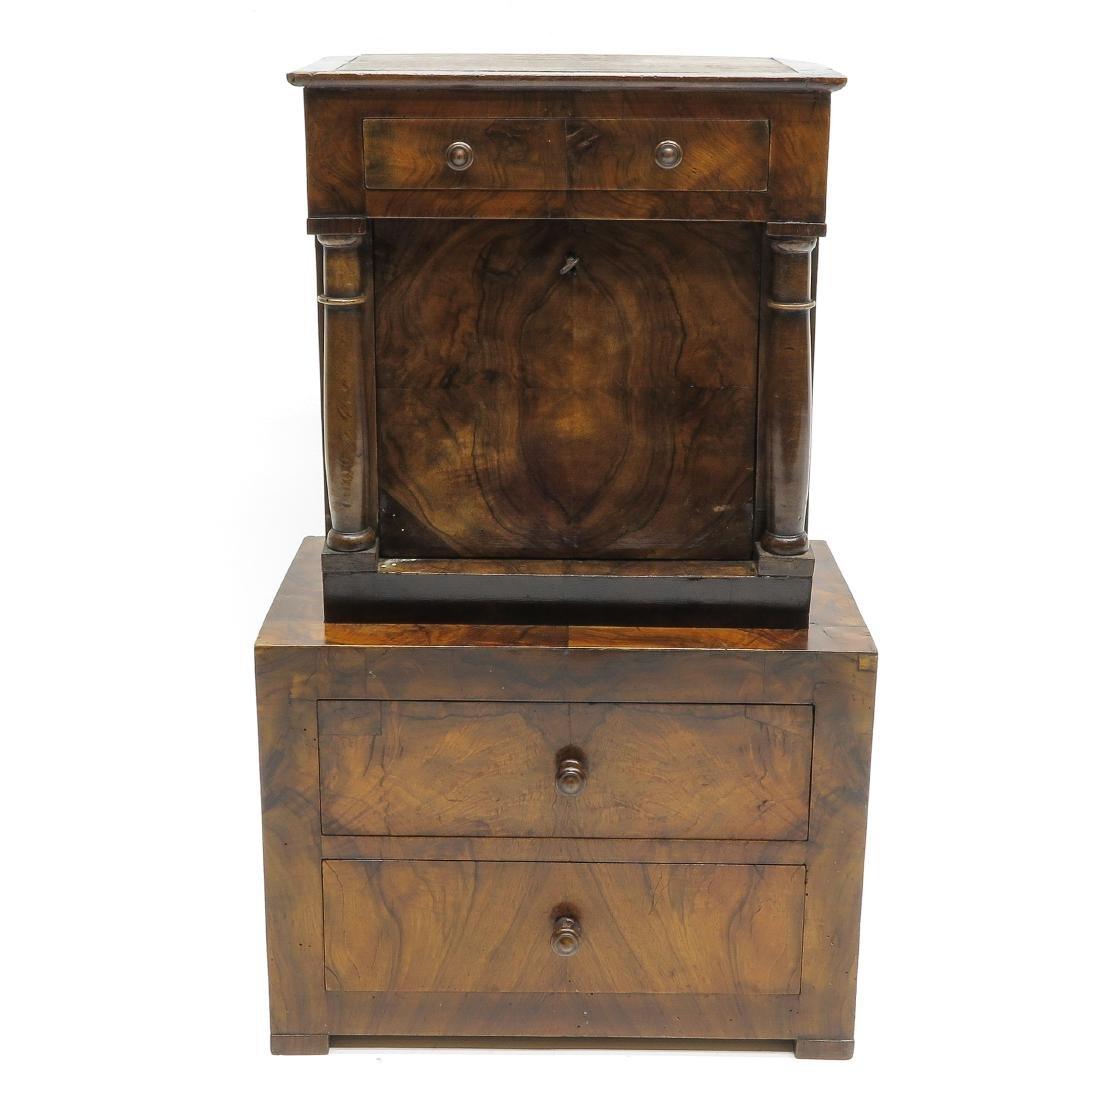 A 19th Century Miniature Walnut Cabinet